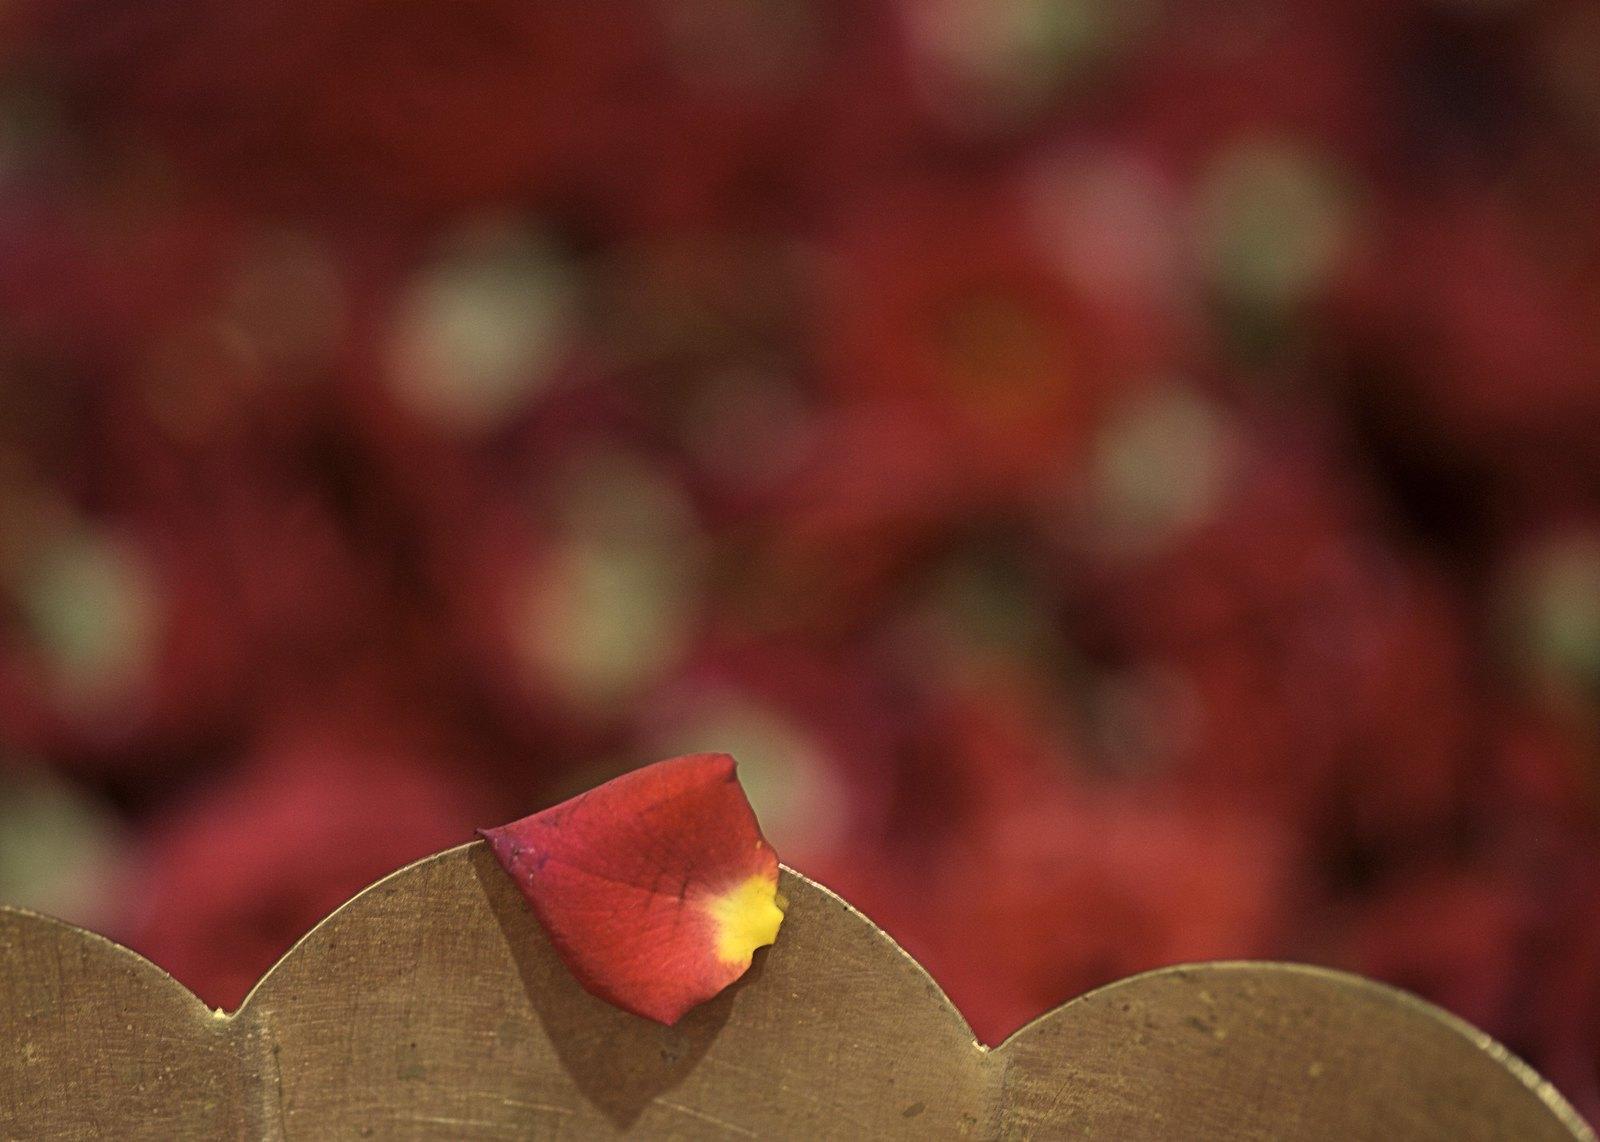 Rose Petal Pentaxforums